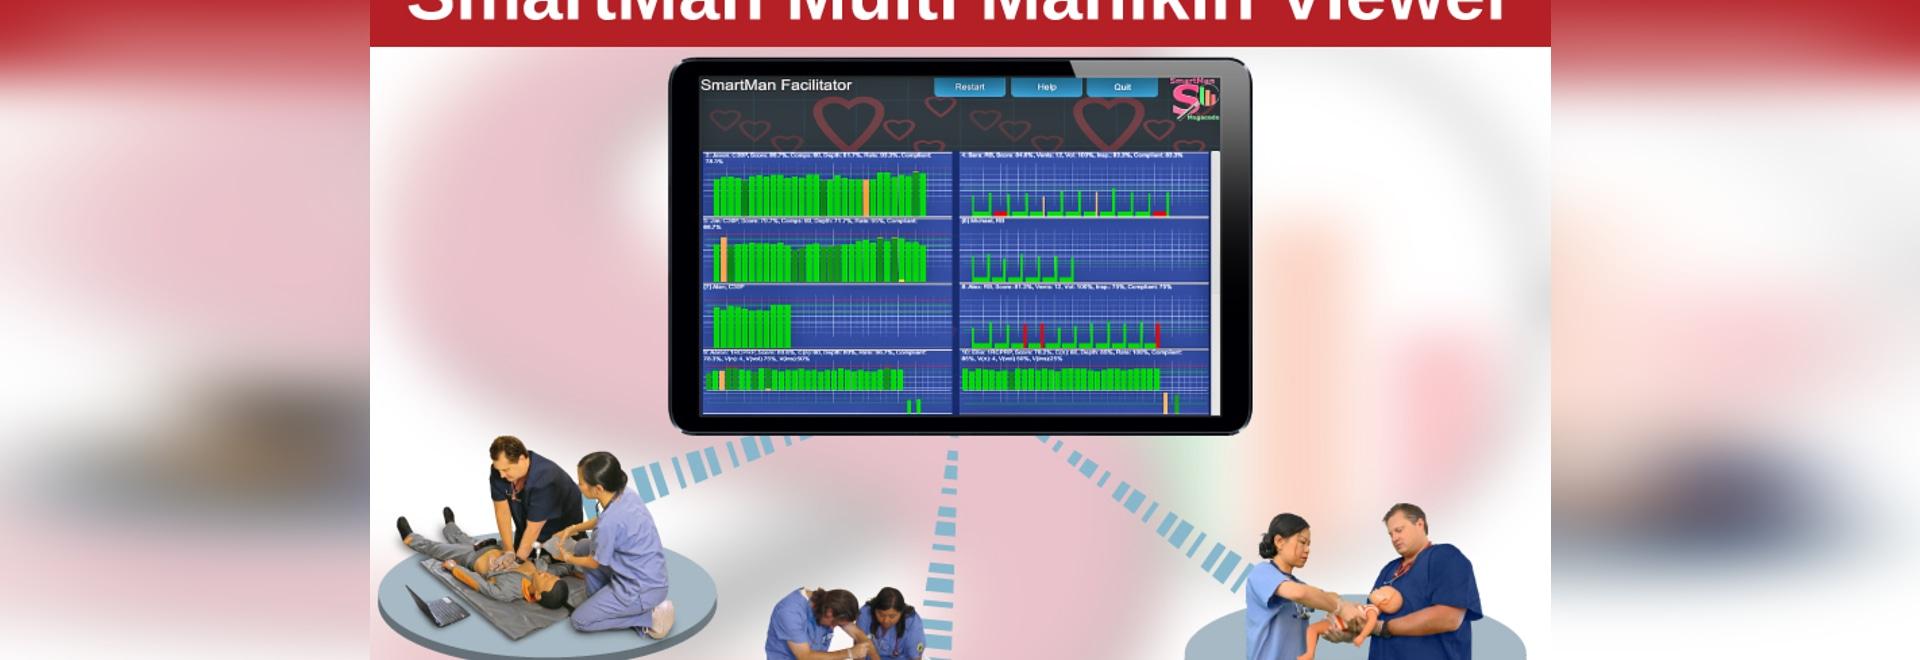 SmartMan Multi-Manikin Viewer